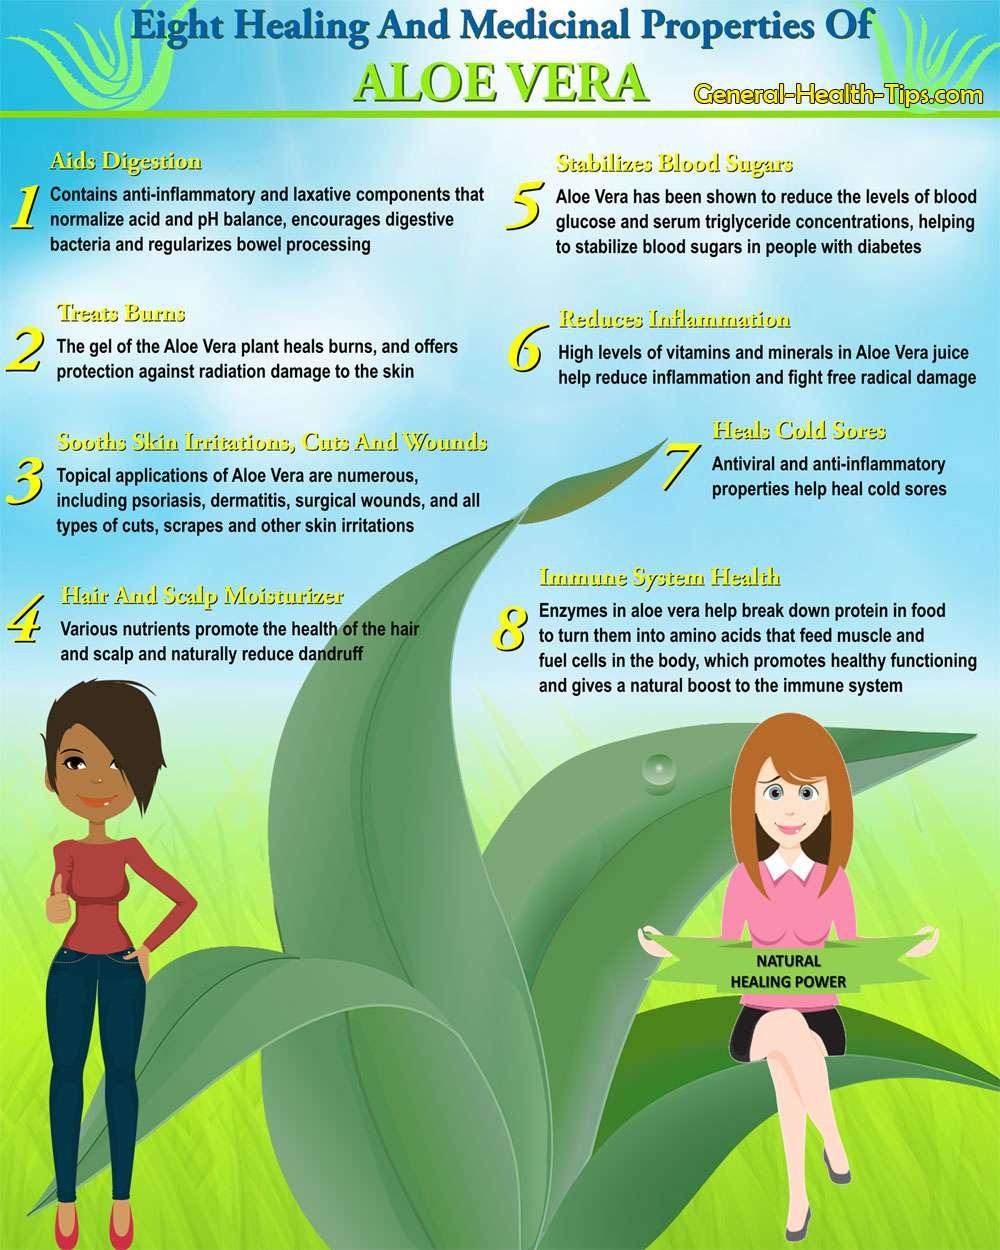 aloe-vera-cures-8-healing-medical-properties